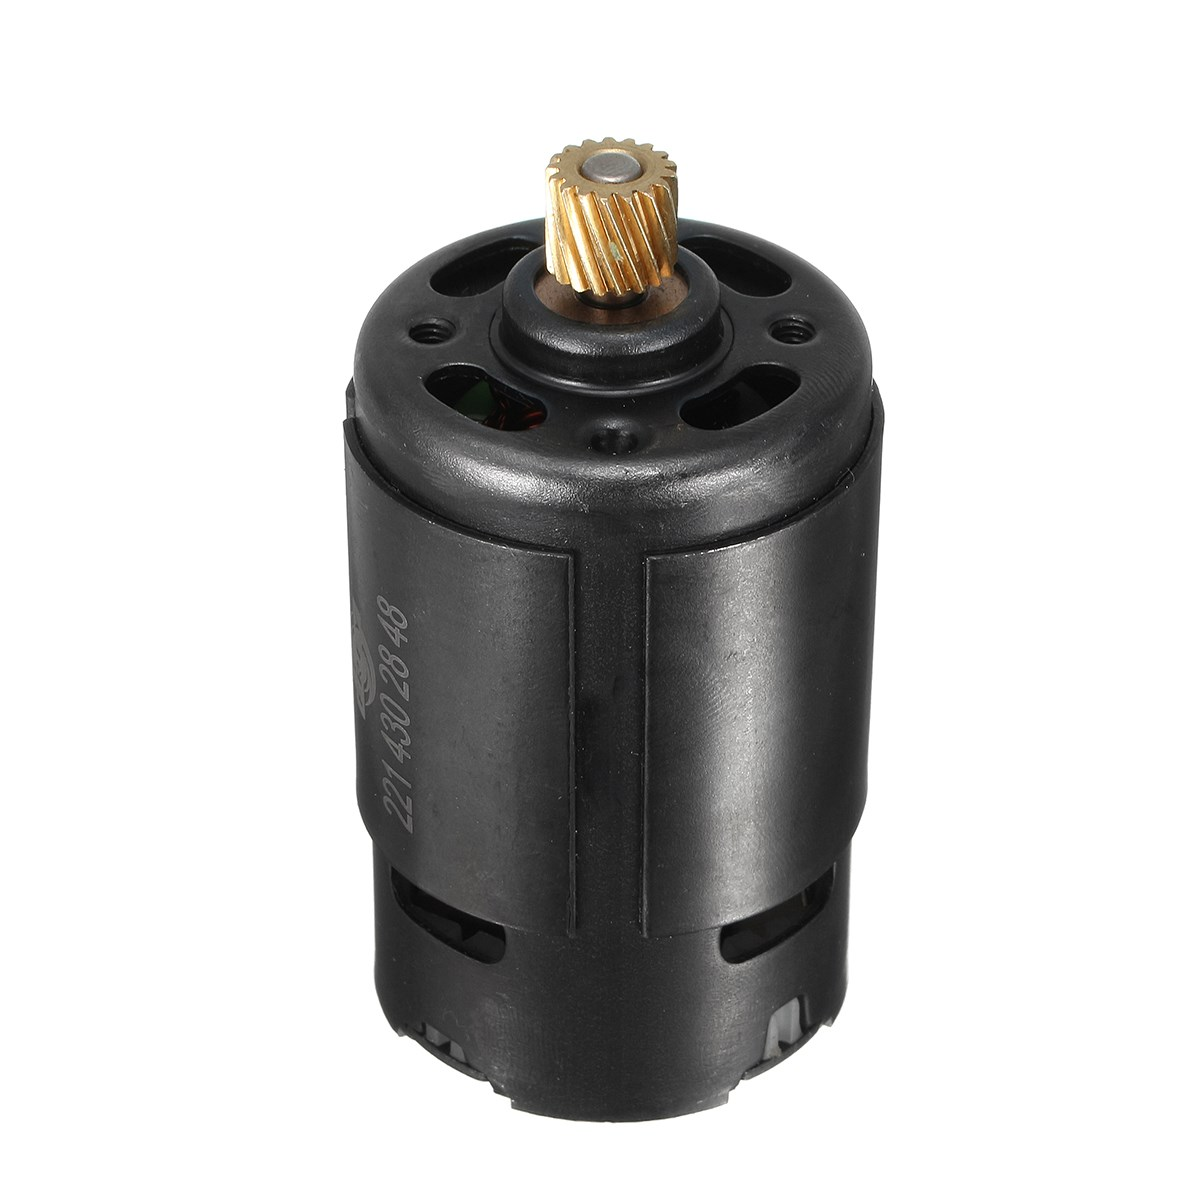 Parking Handbrake Actuator Motor Hand Parking Brake for BENZ W221 S300 S350 S500 S600 S420 2214302848